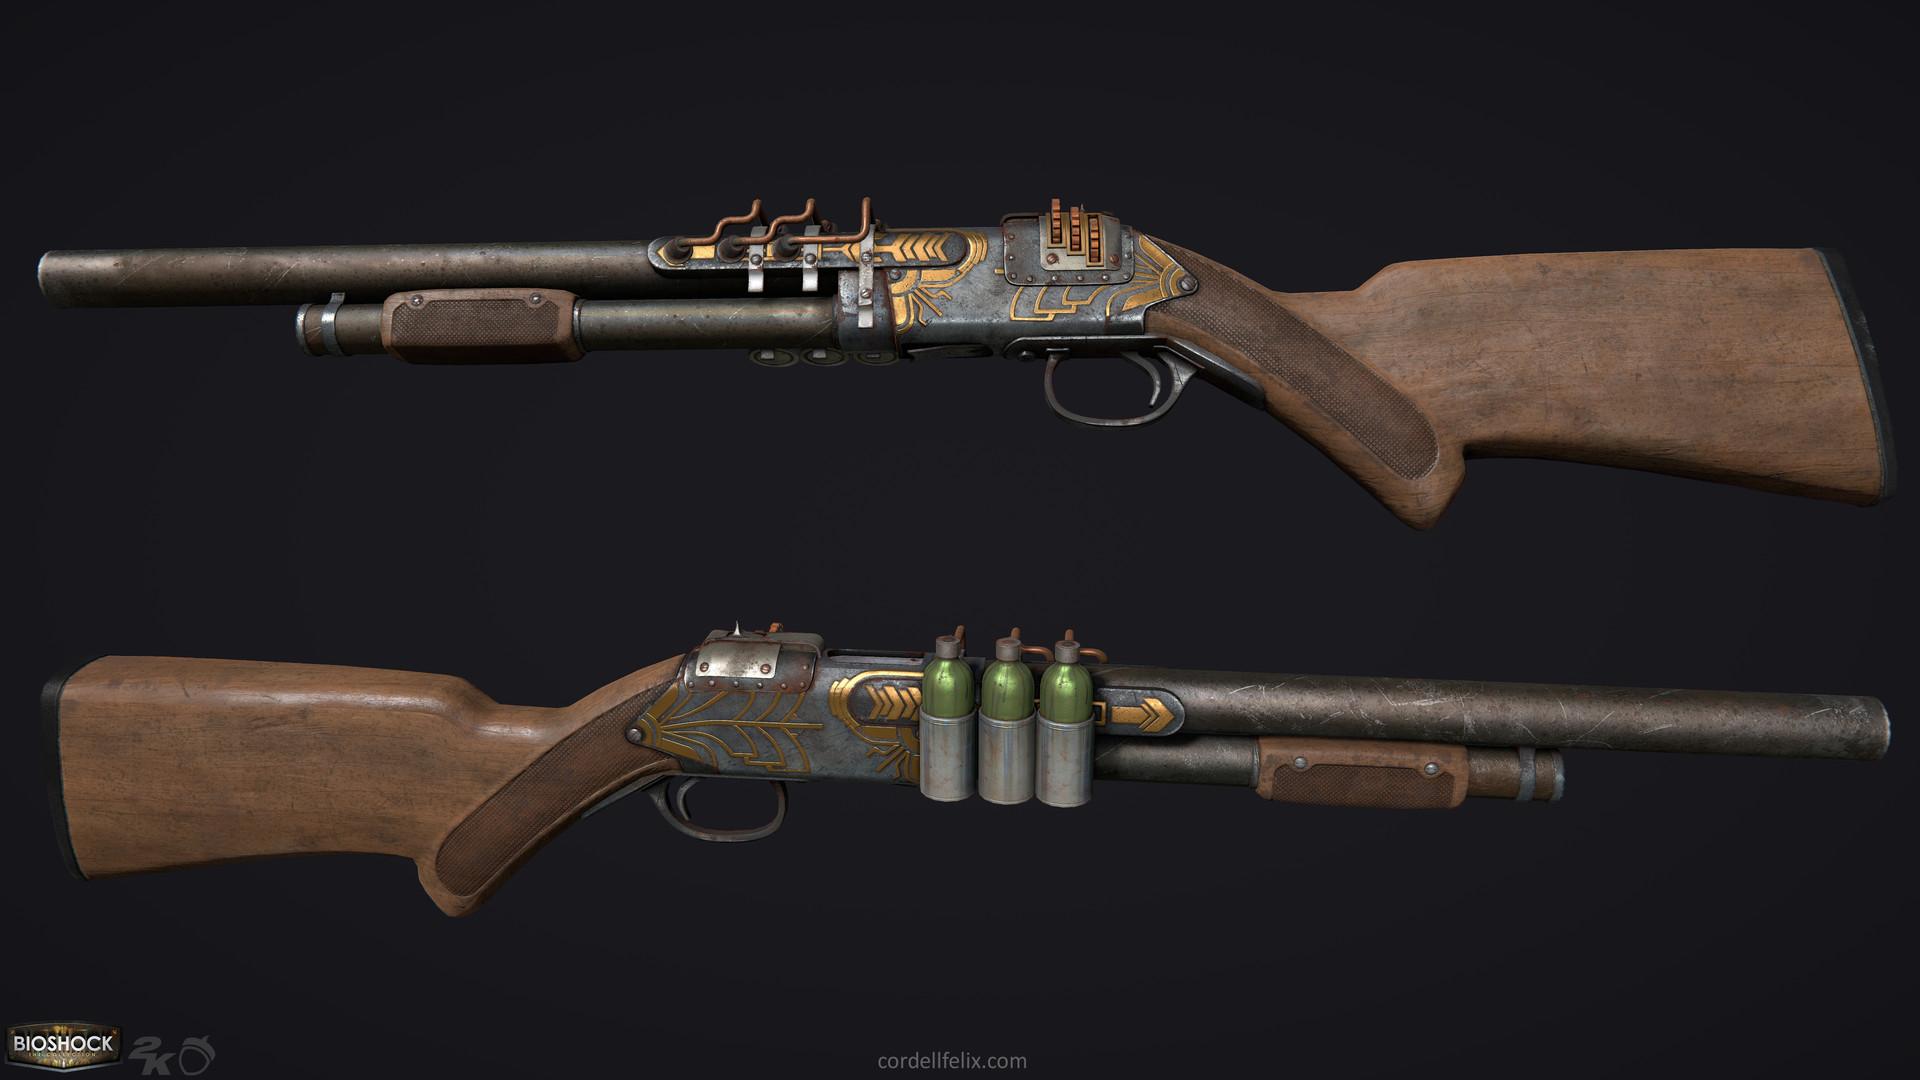 Cordell felix cordellfelix shotgun 03